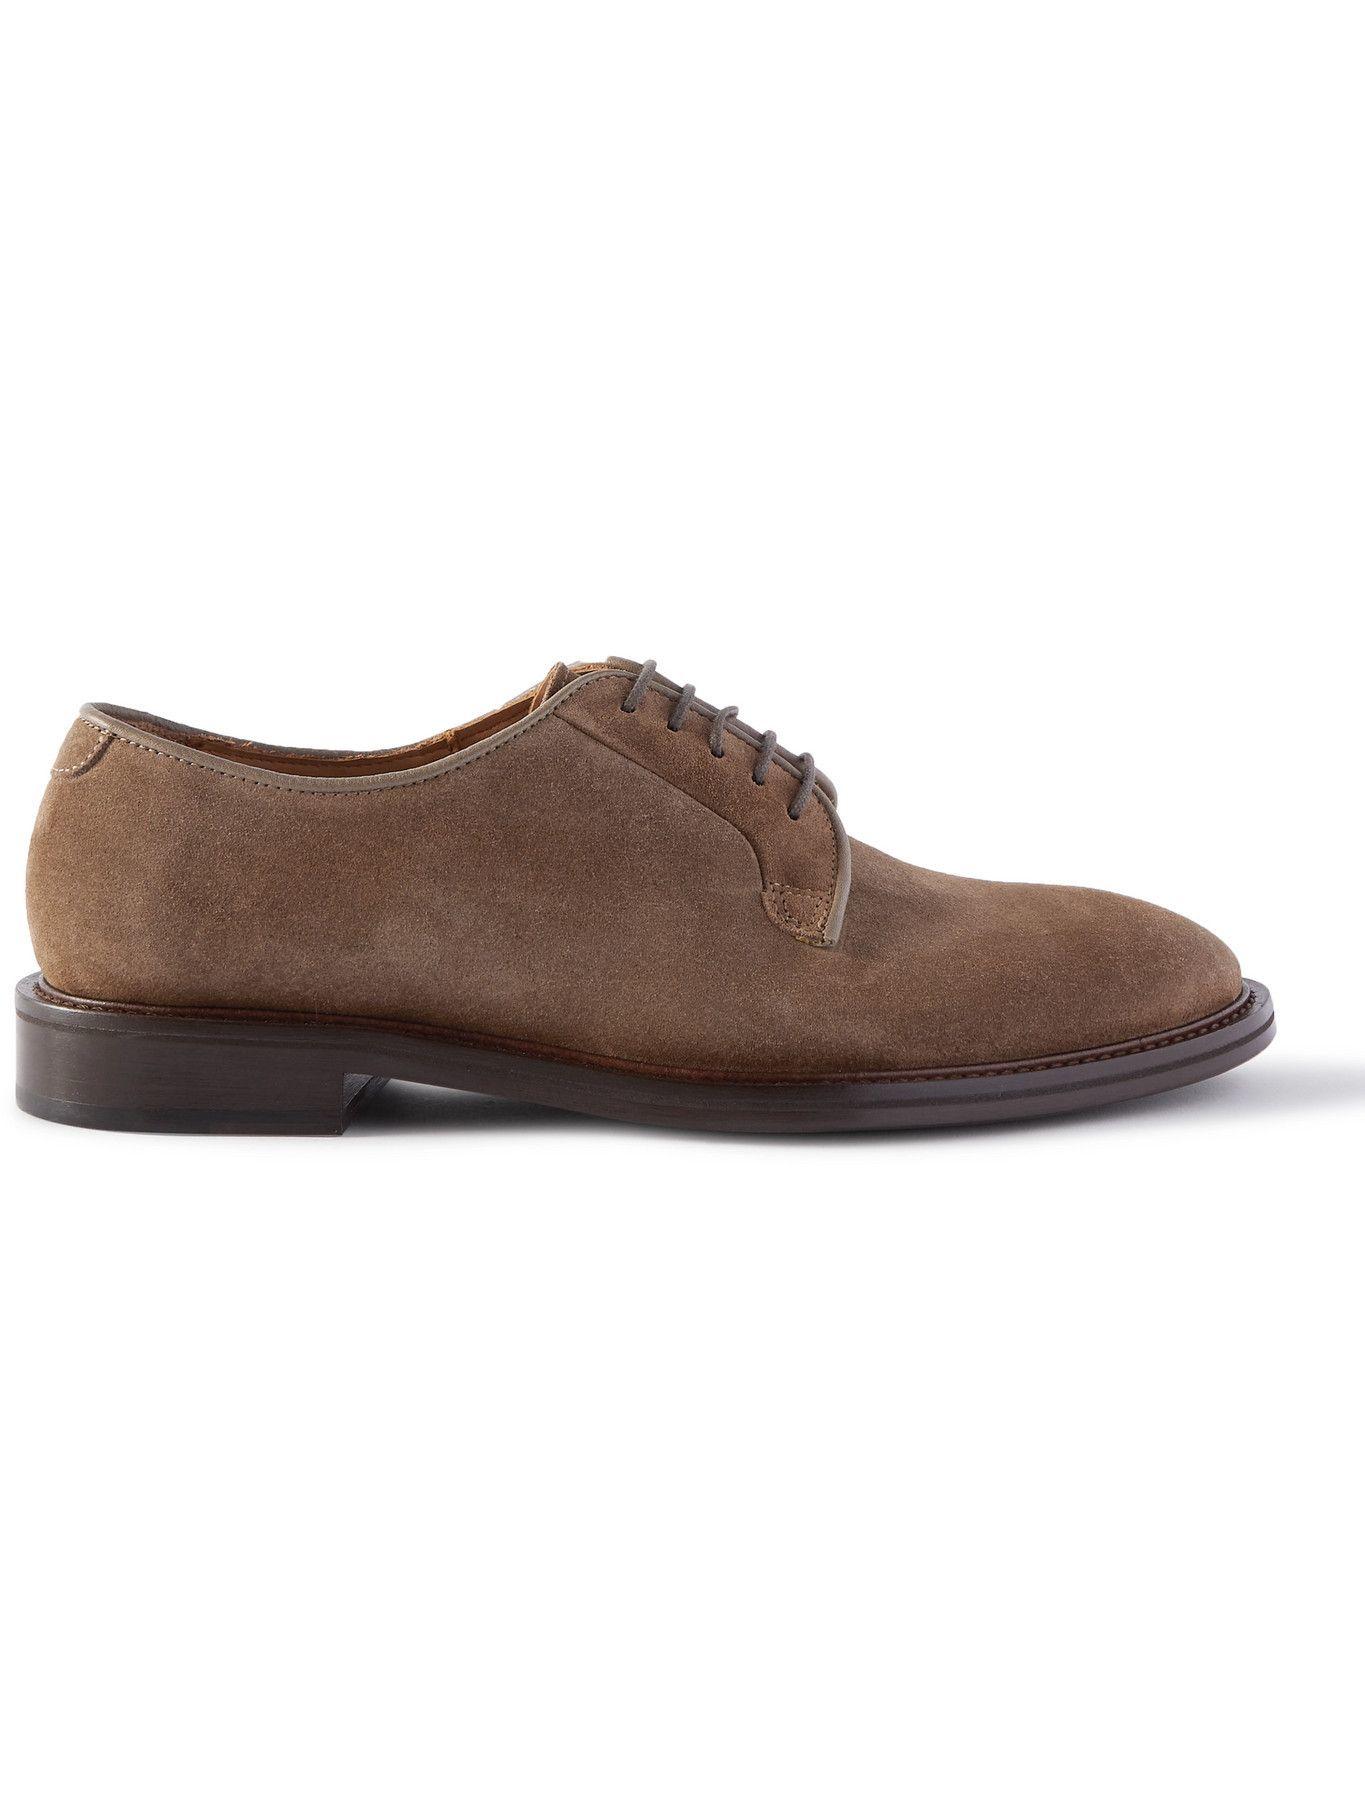 Photo: Mr P. - Lucien Suede Derby Shoes - Brown